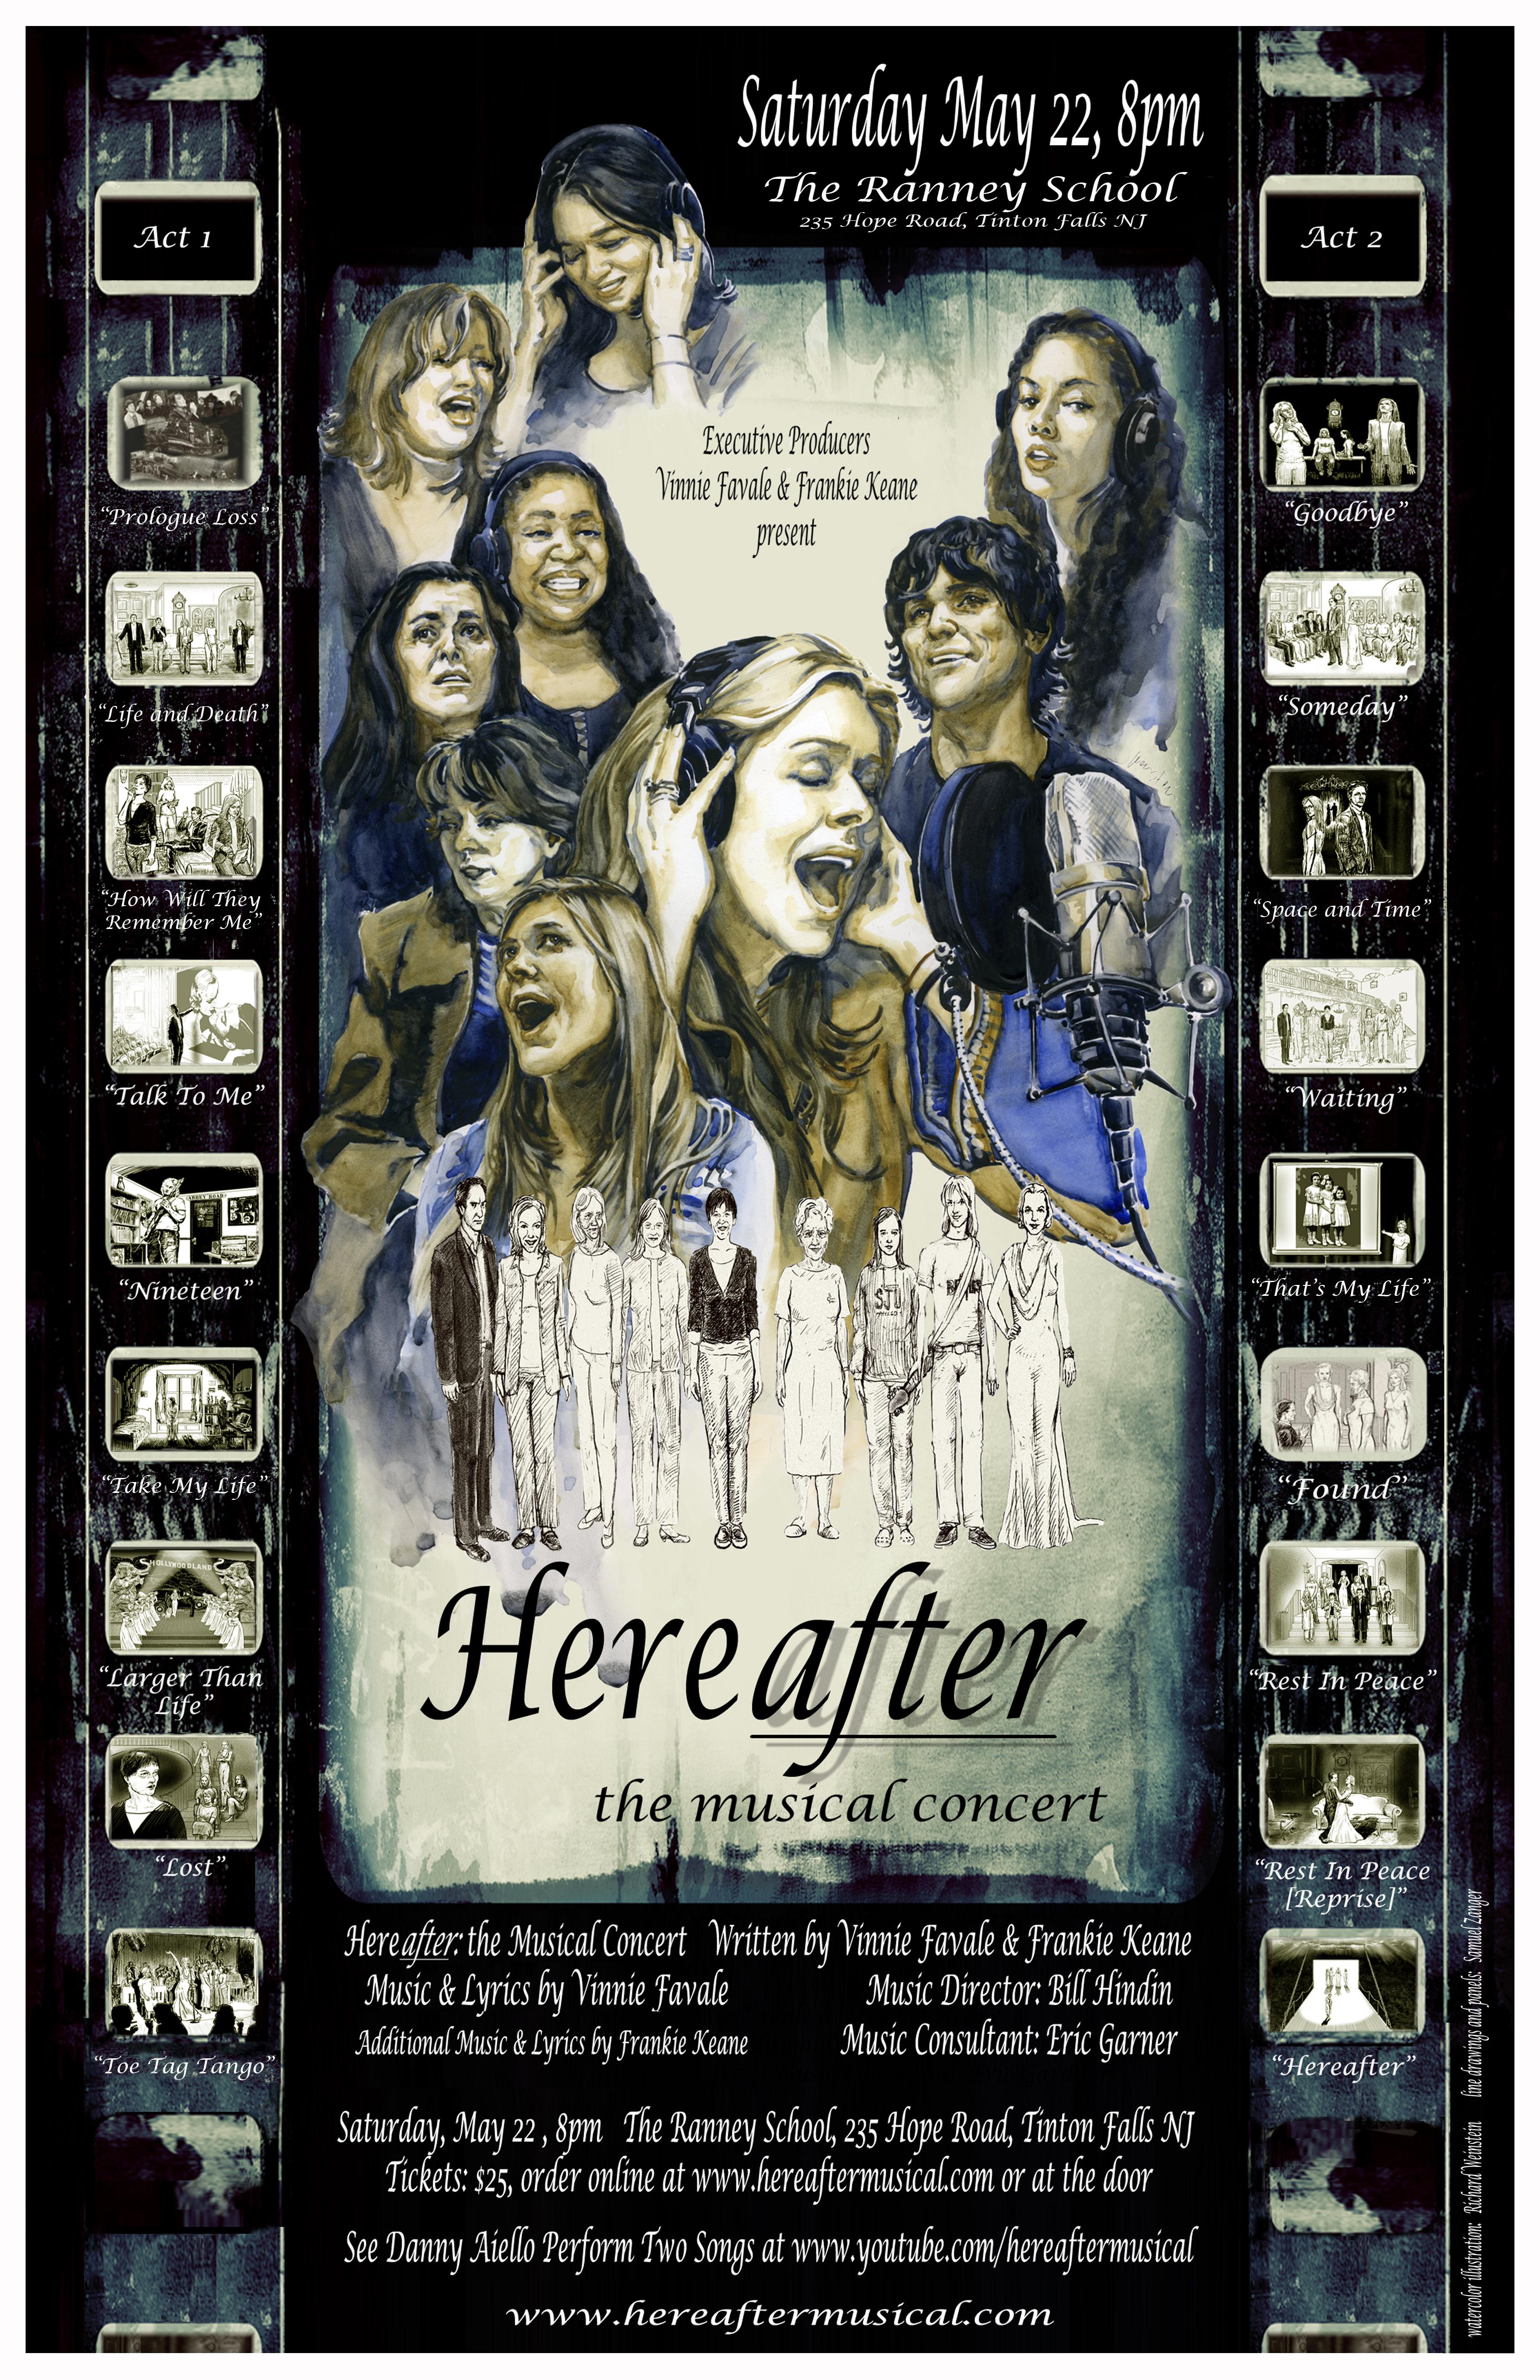 hereafter-concert-poster-c-final-final_4